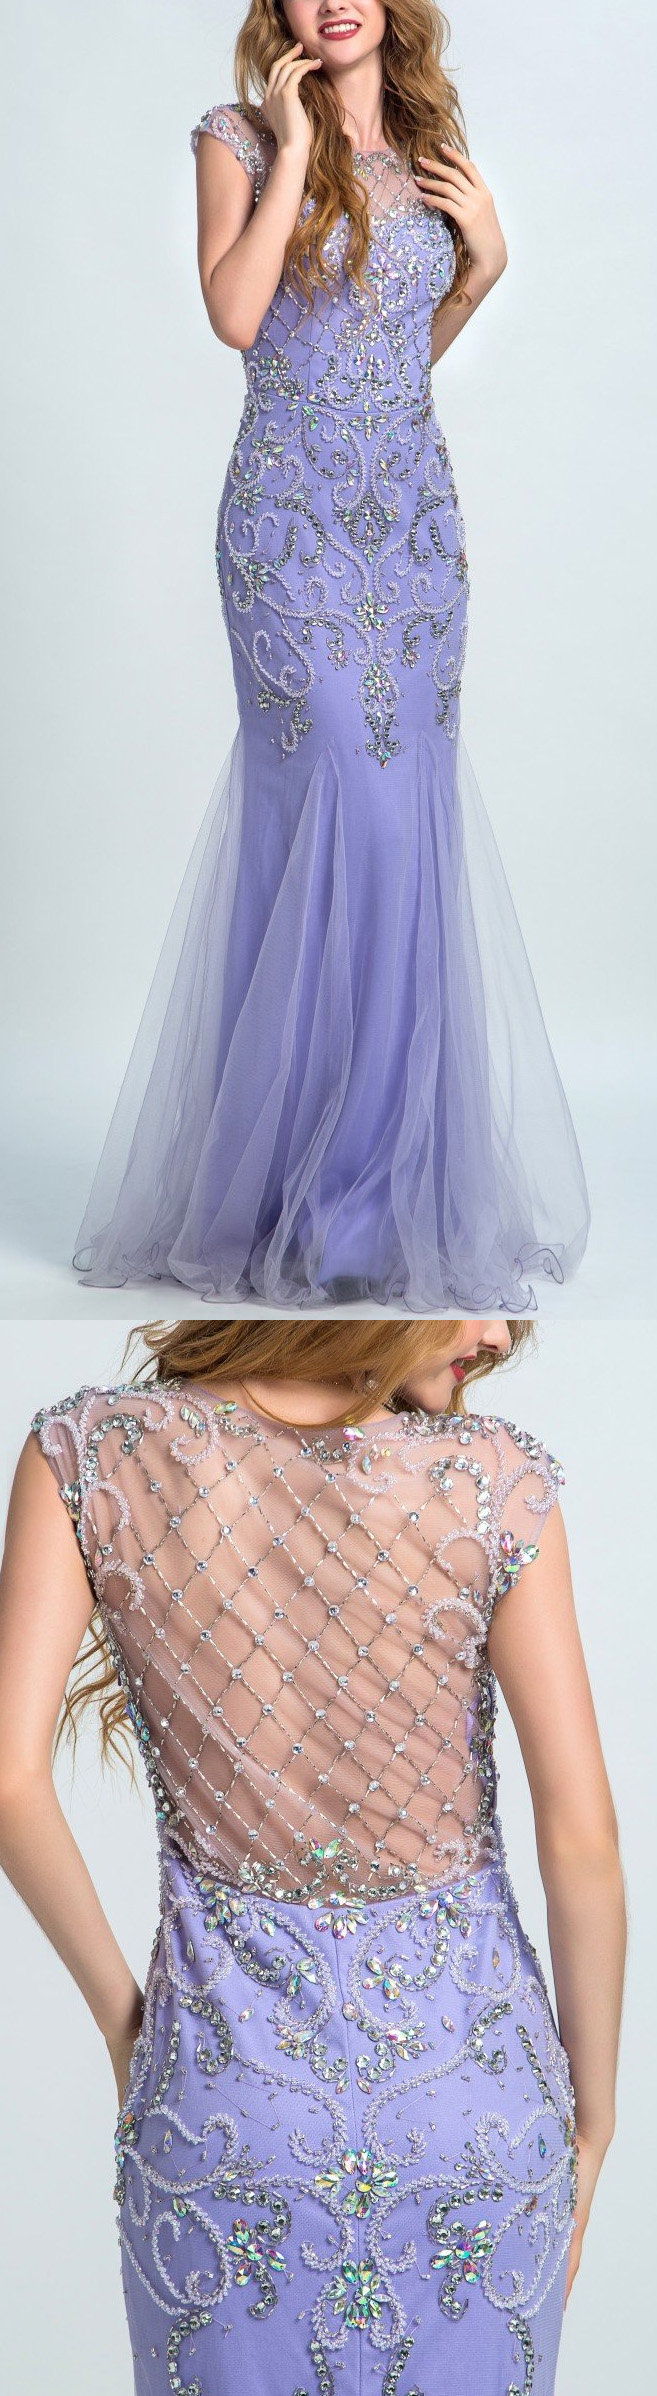 Mermaidtrumpet prom evening dresses long lavender dresses with side